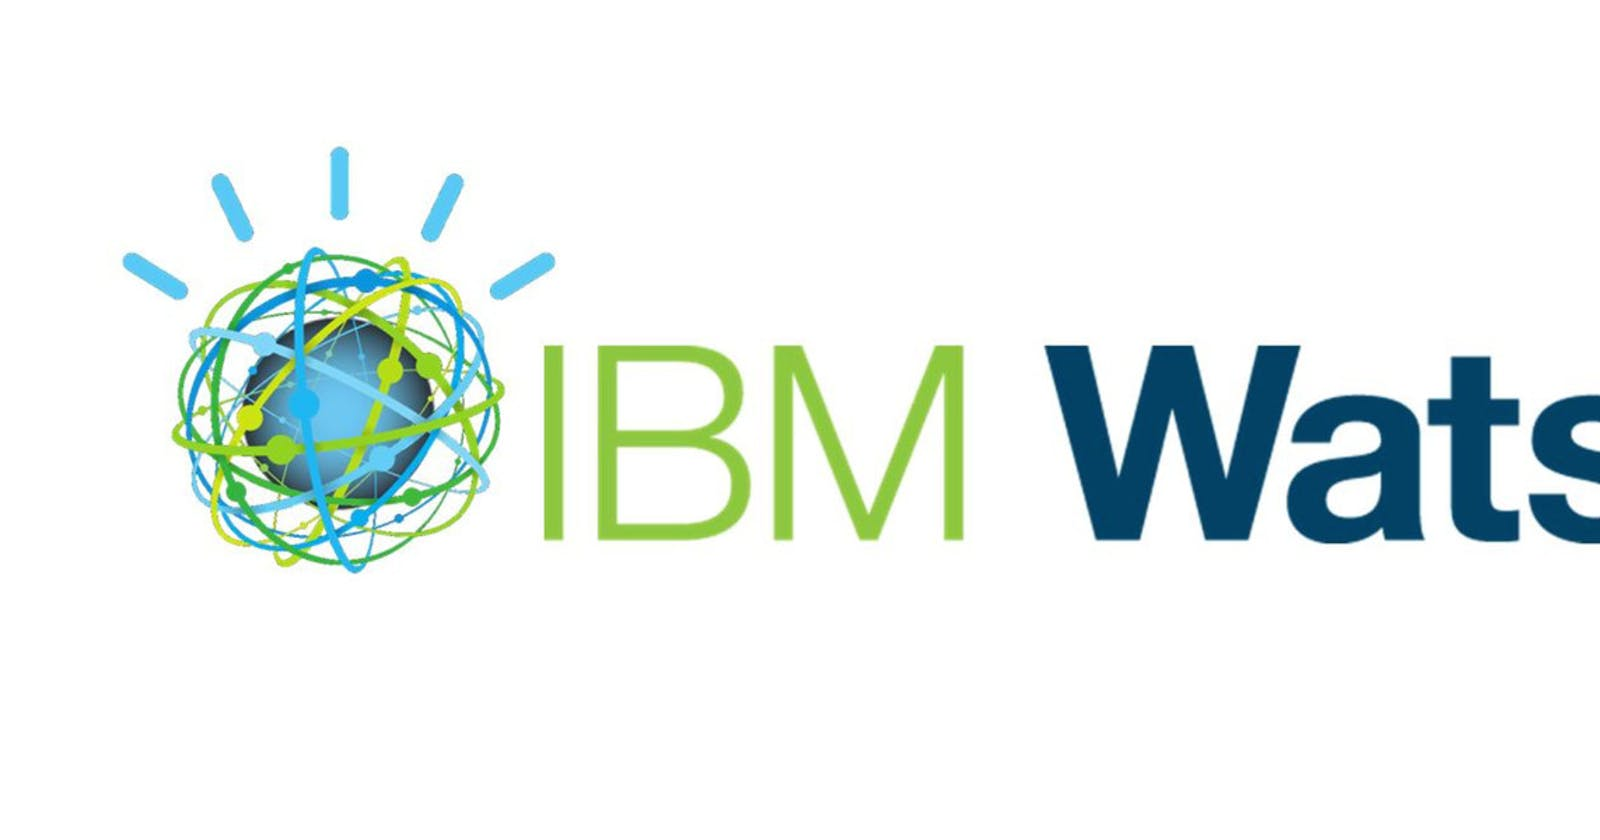 Make Your Computer Talk using IBM Watson